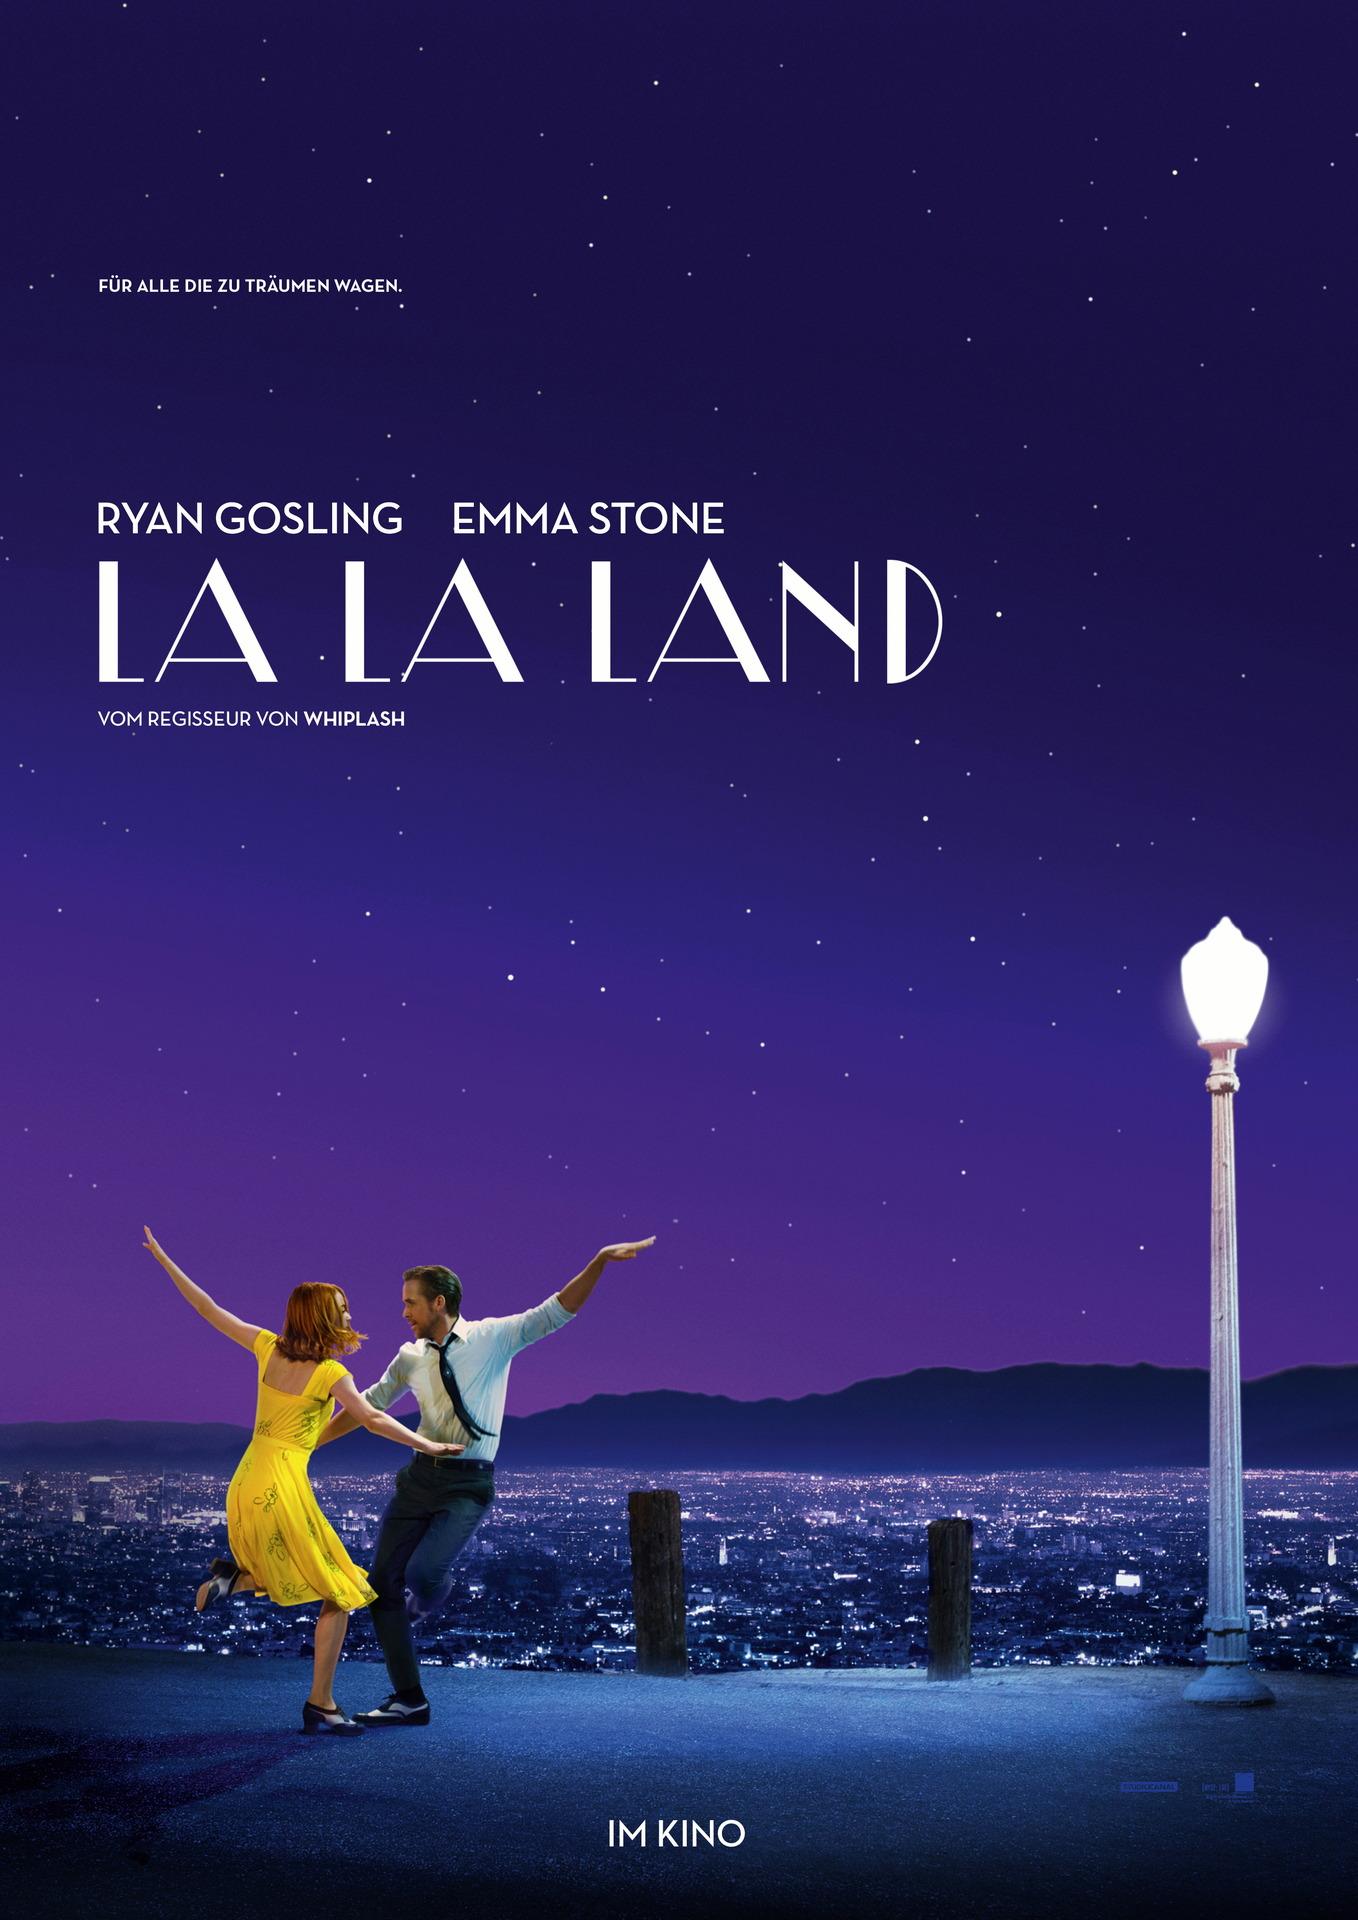 la-la-land-3-rcm0x1920u